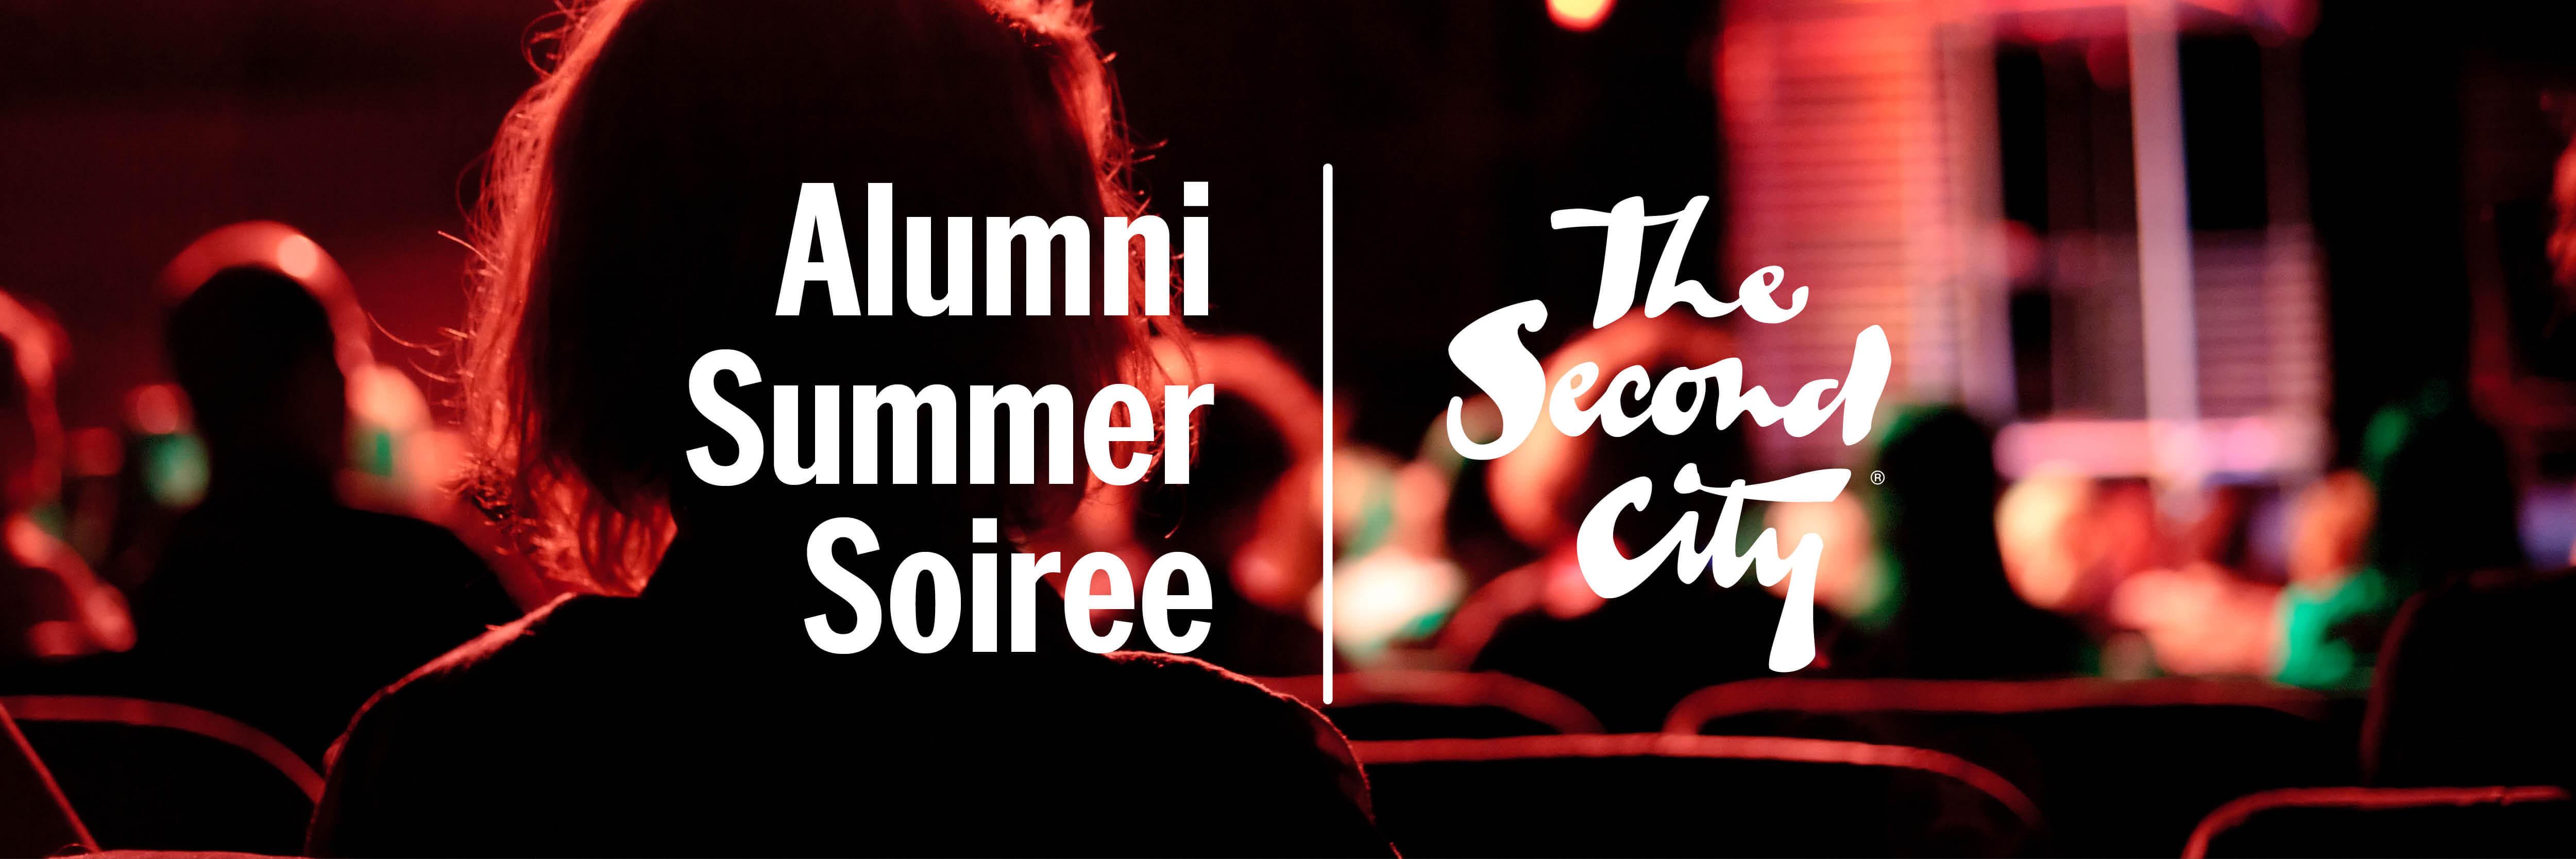 40411_Alumni_Summer_Soiree_Email_Banner.jpg